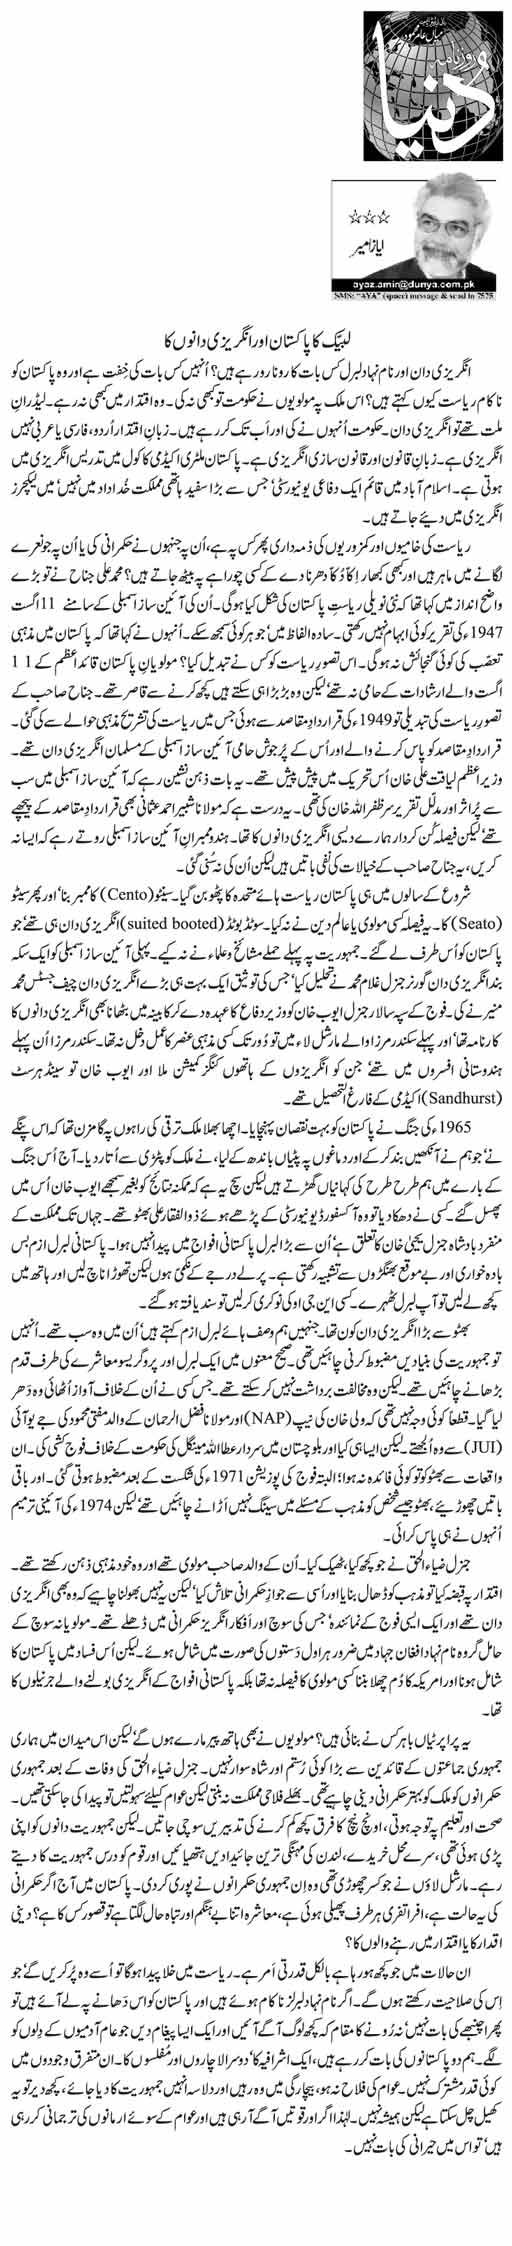 Labbaik Ka Pakistan Aur Angrezi Dano Ka | Ayaz Amir | Daily Urdu Columns